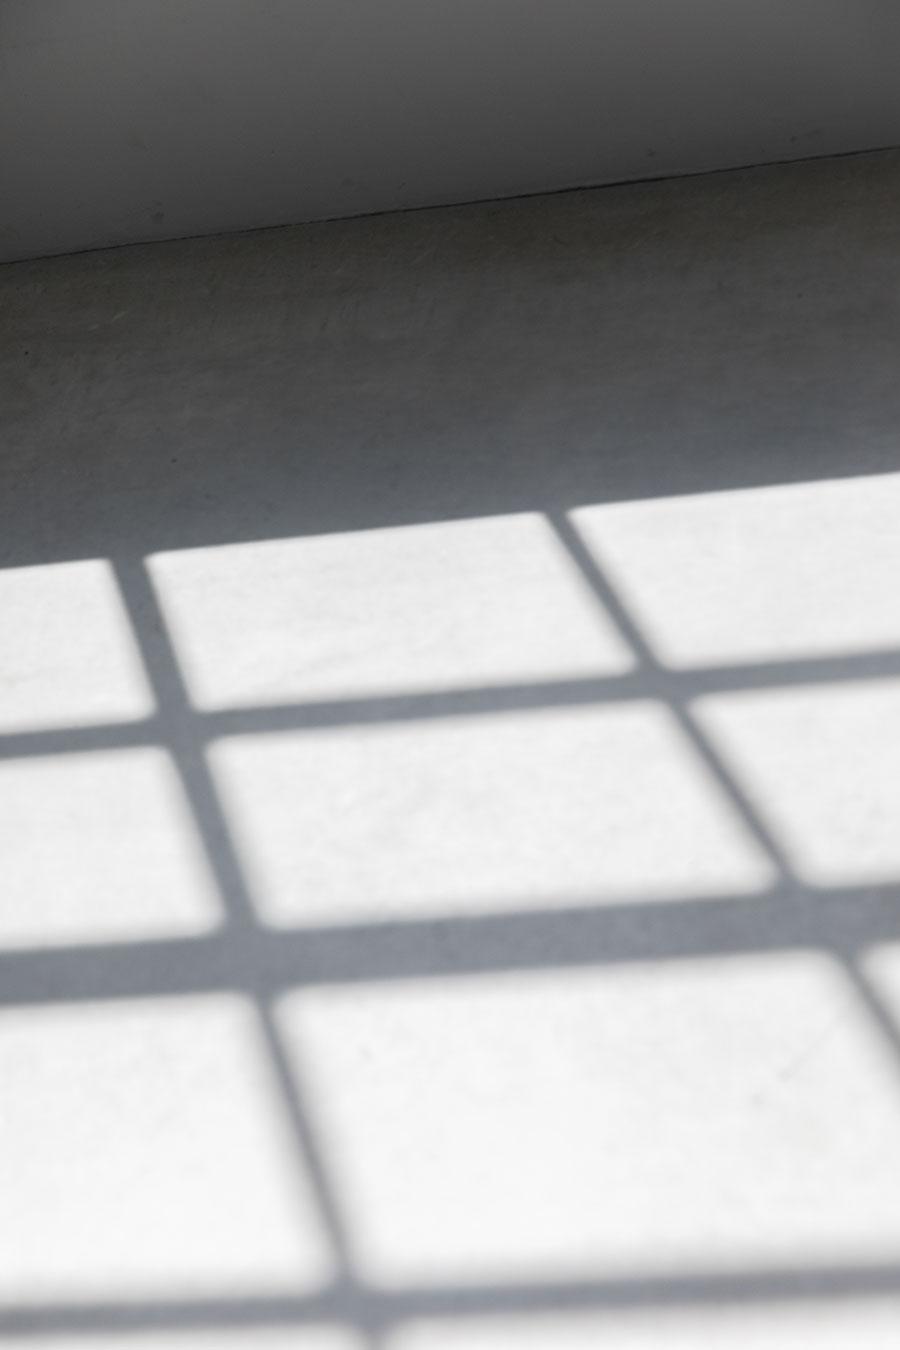 "Todd Wilson   The following is placeholder text known as ""lorem ipsum,"" which is scrambled Latin used by designers to mimic real copy. Fusce at massa nec sapien auctor gravida in in tellus. Nulla eu pretium massa. Sed a ligula quis sapien lacinia egestas. Donec eget risus diam."